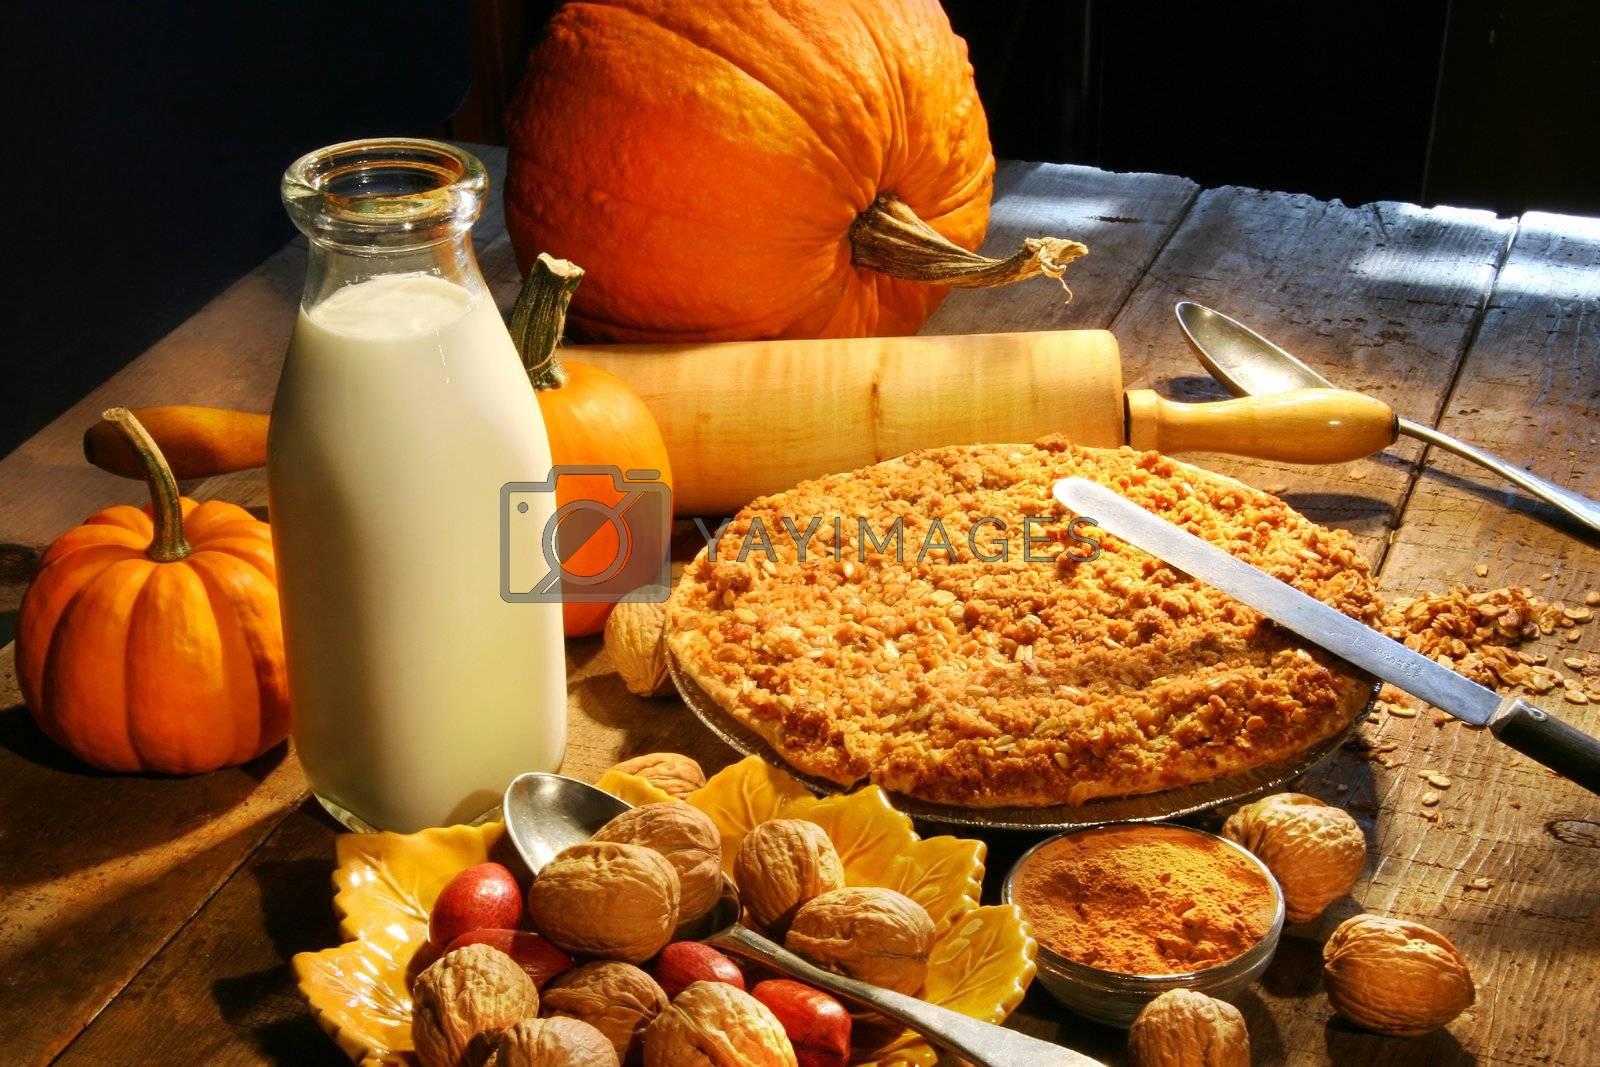 Preparing ingredients for holiday desserts